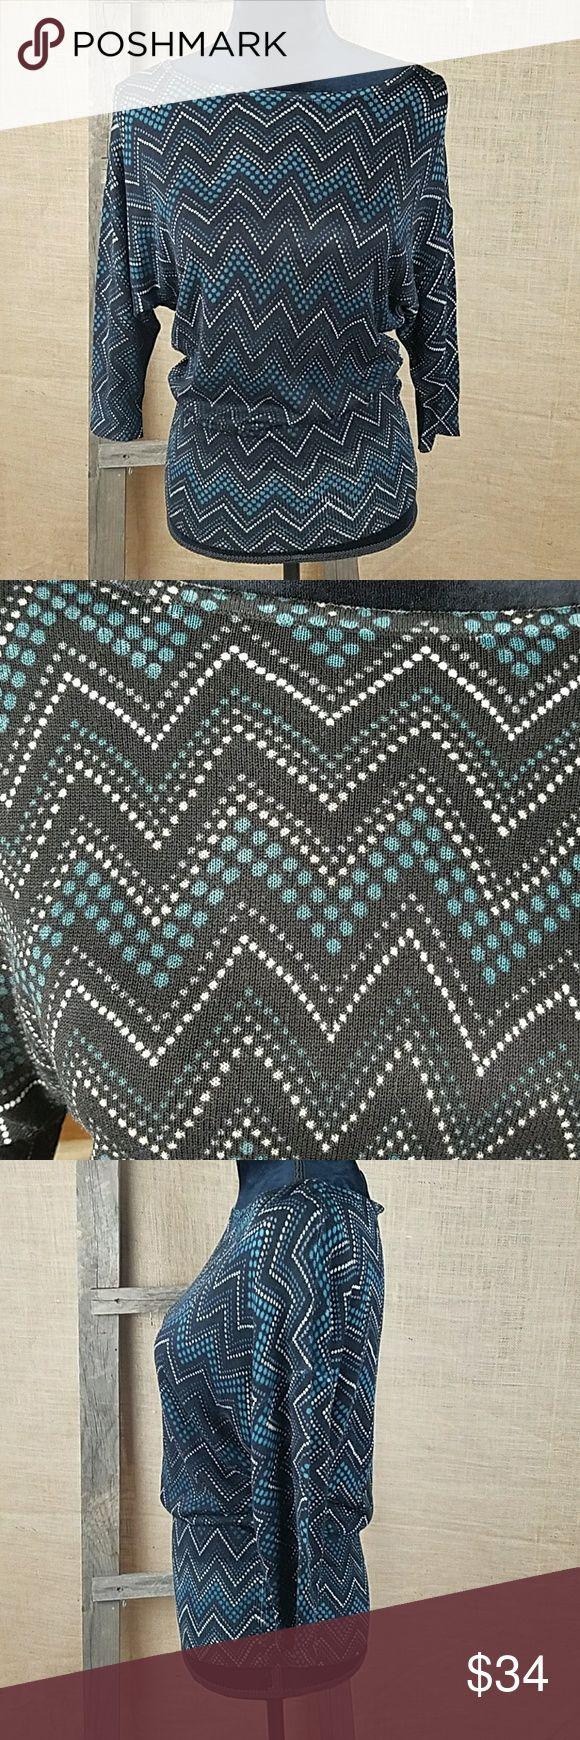 "White House Black Market women's XXS knitted White House Black Market women's XXS knitted 3/4 sleeve top pullover chevron.  Under arm to under arm: 22.5"" length: 27.5"" White House Black Market Sweaters Crew & Scoop Necks"